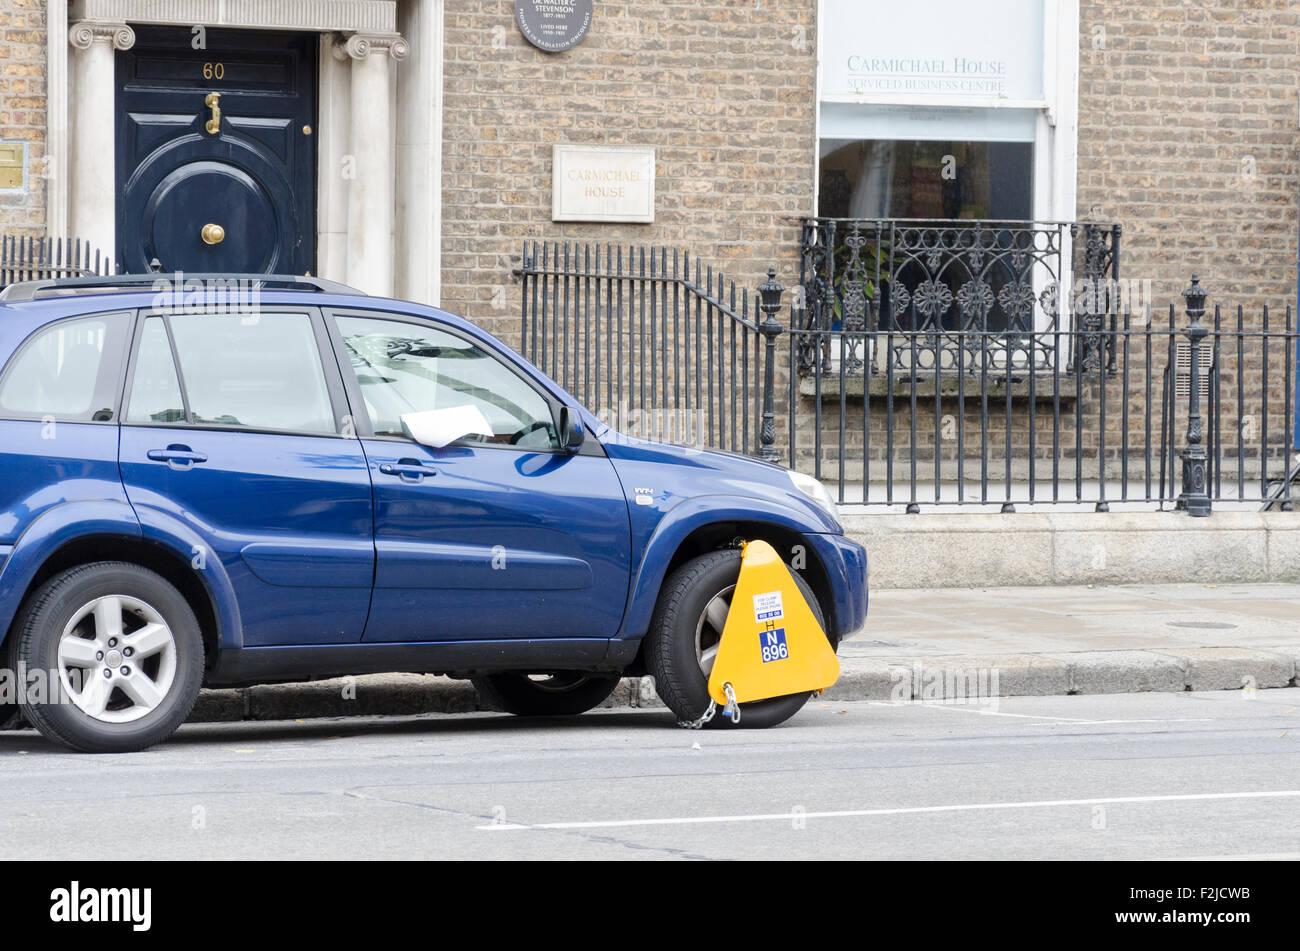 Car clamped in Dublin, Ireland - Stock Image